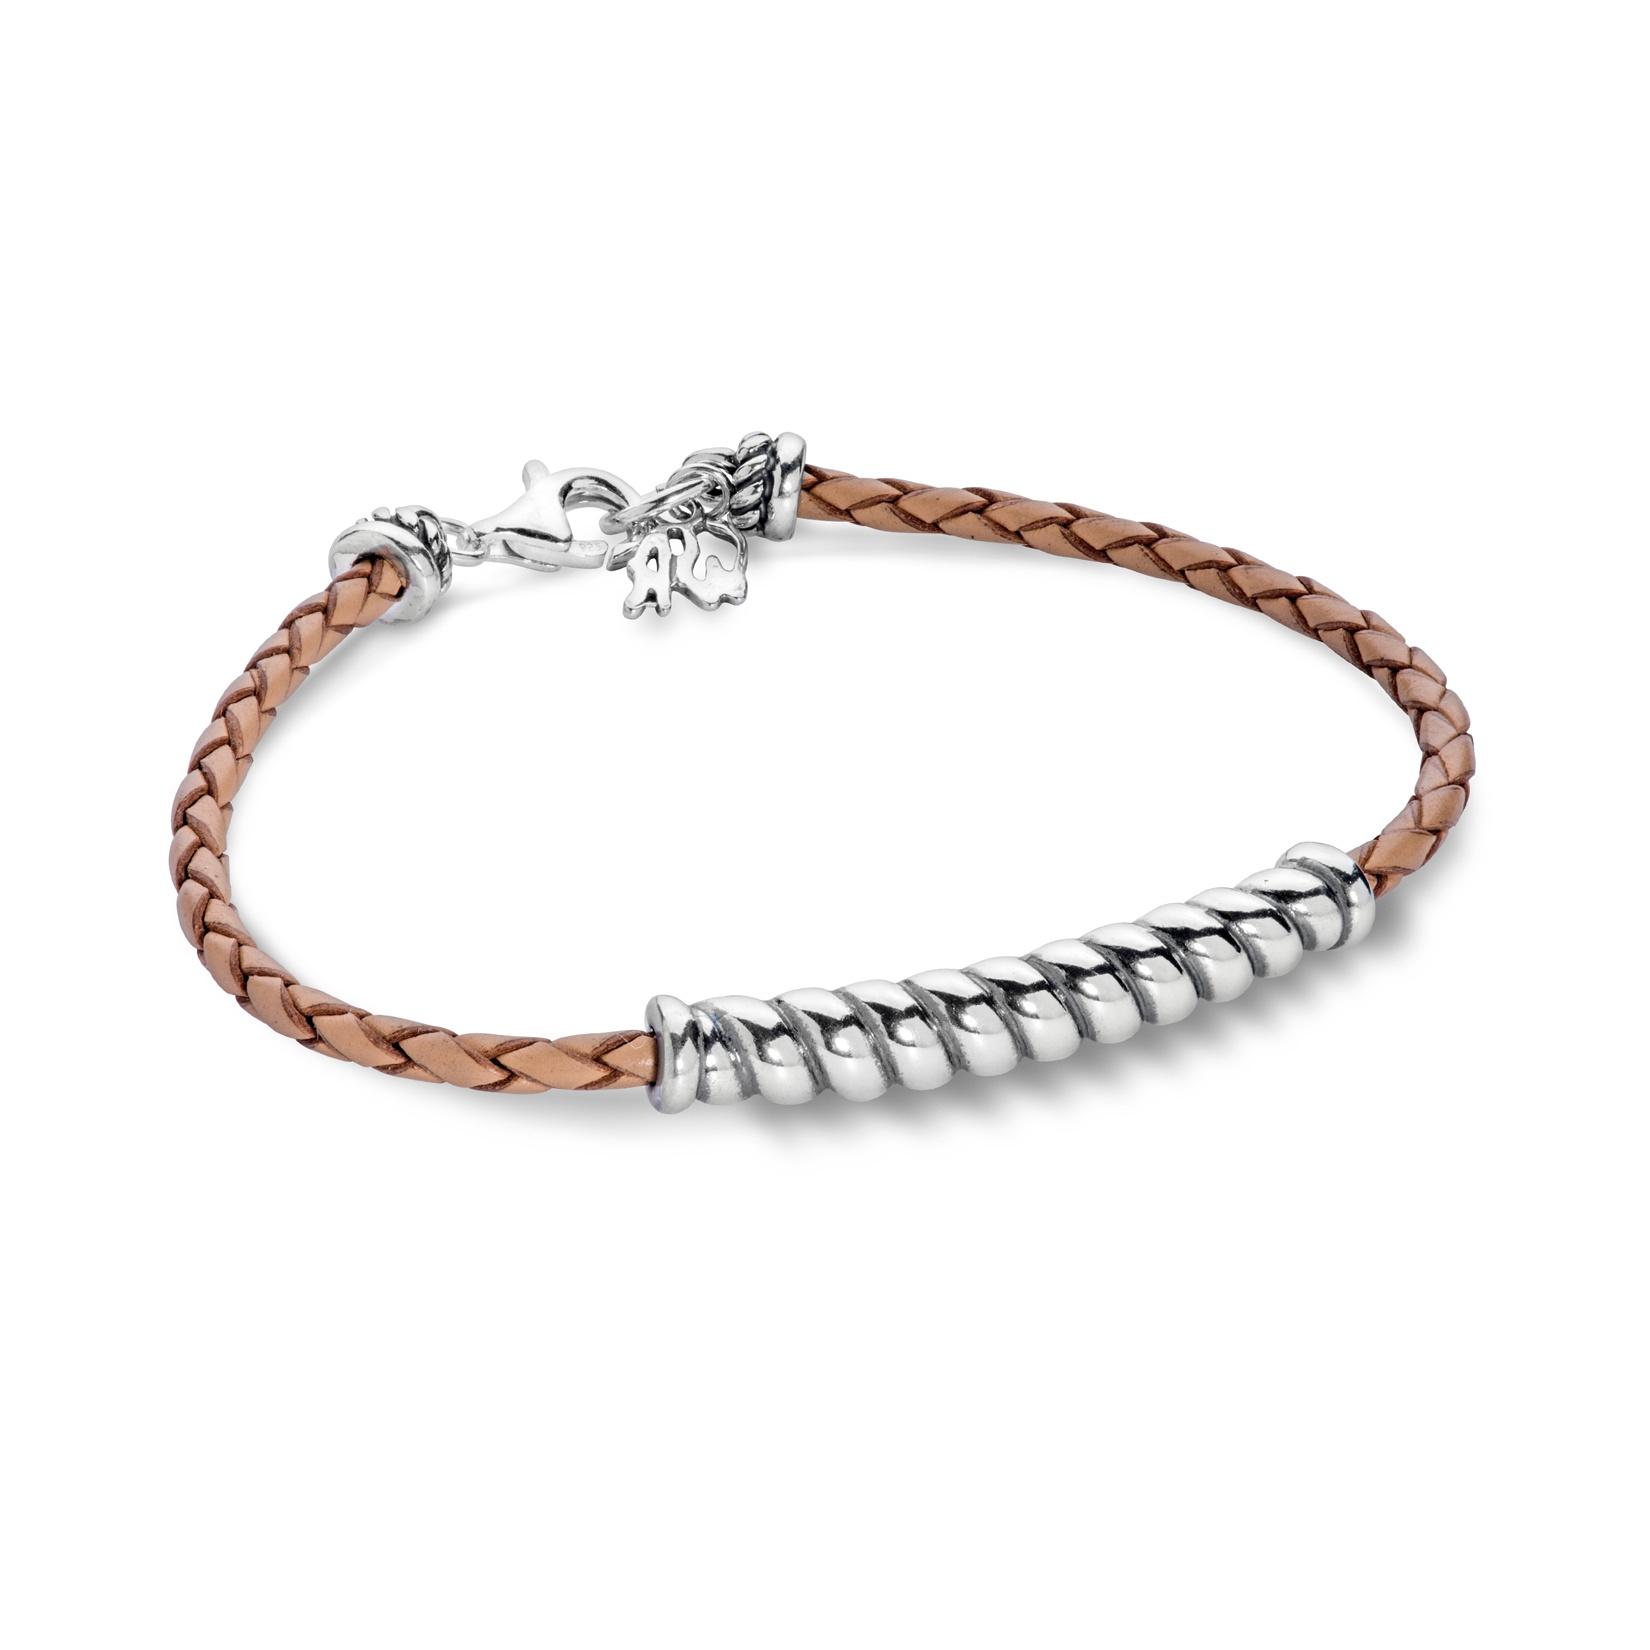 Sterling Silver Braided Rope Bar on Beige Leather Bracelet